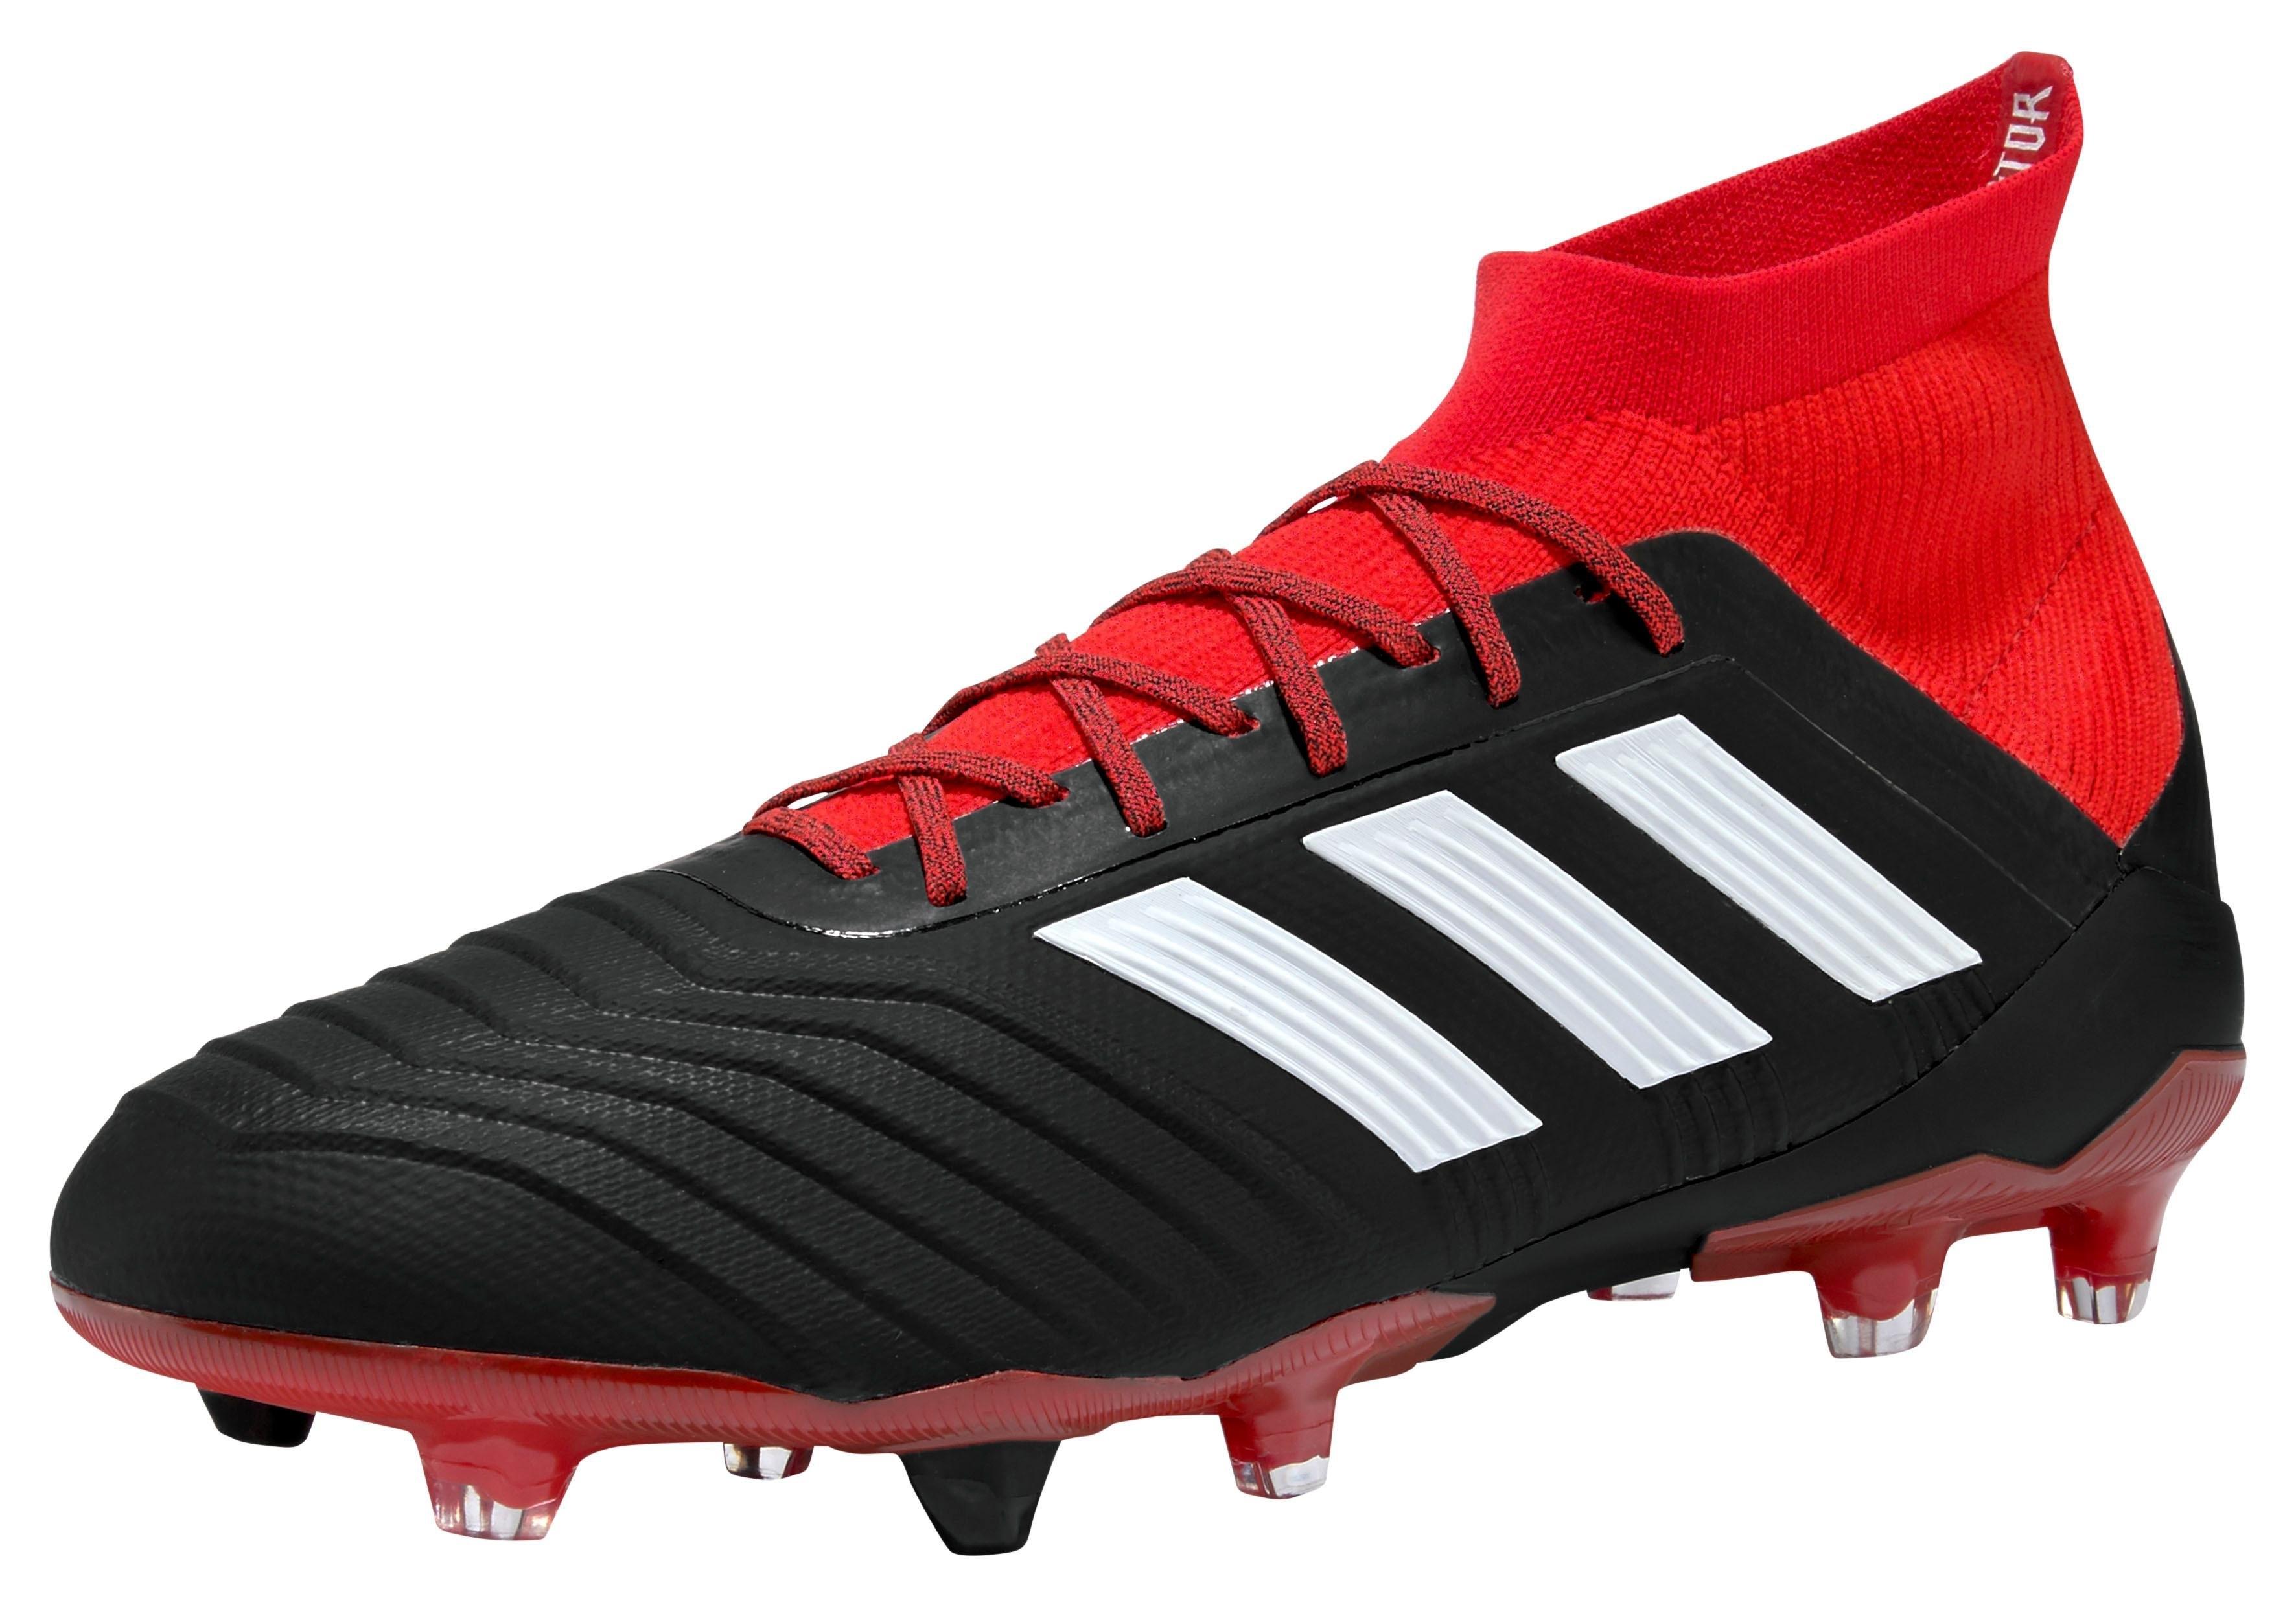 1e59db8e1fa ... 18.1 FG«, adidas Performance voetbalschoenen »Predator 19.1«, Nike  voetbalschoenen »Tiempo Ligera Iv«